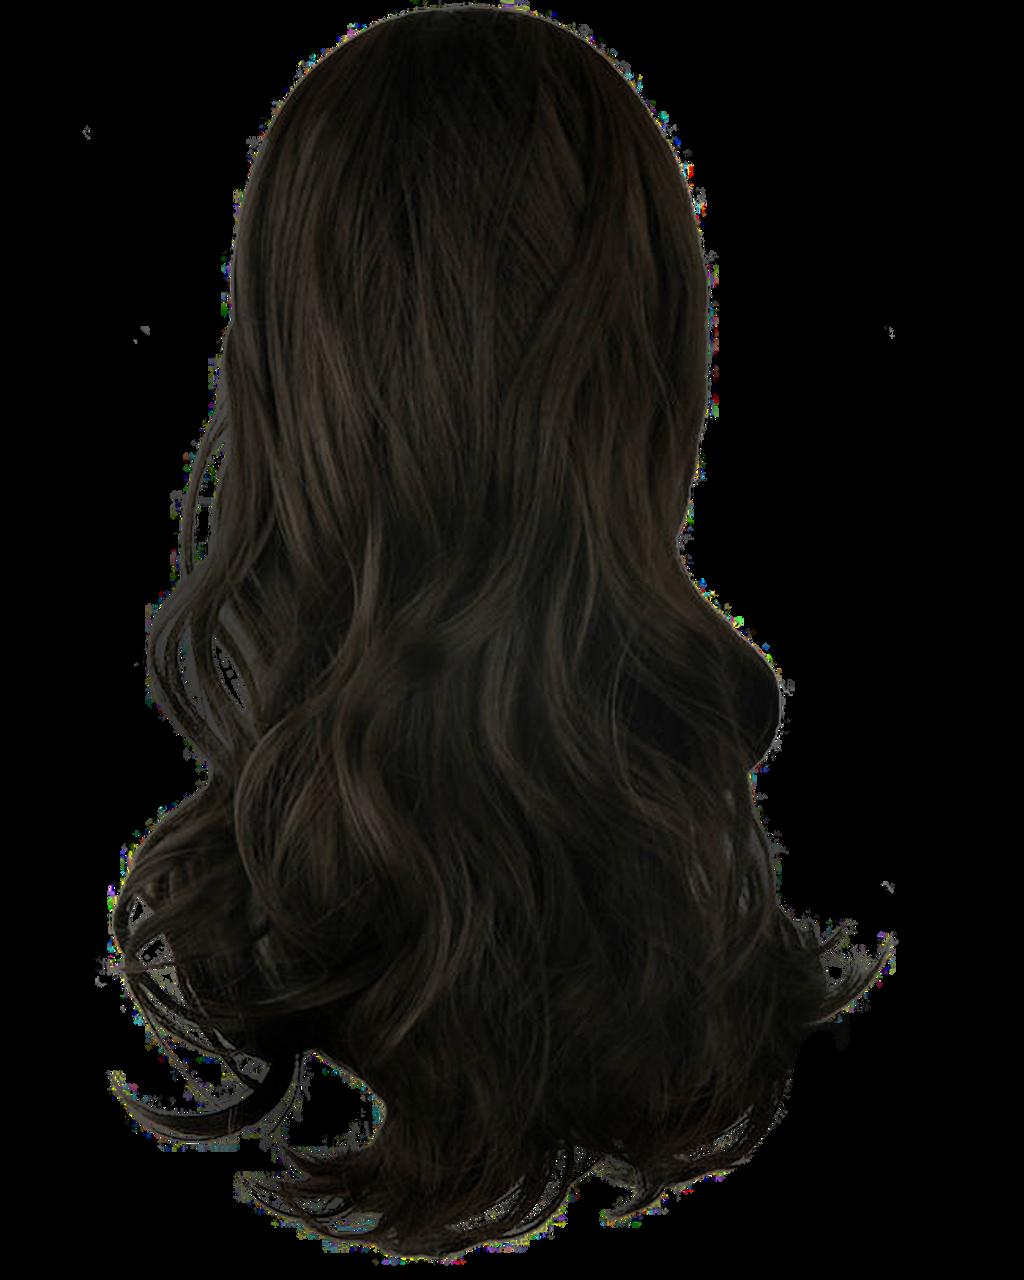 Png Hair 10